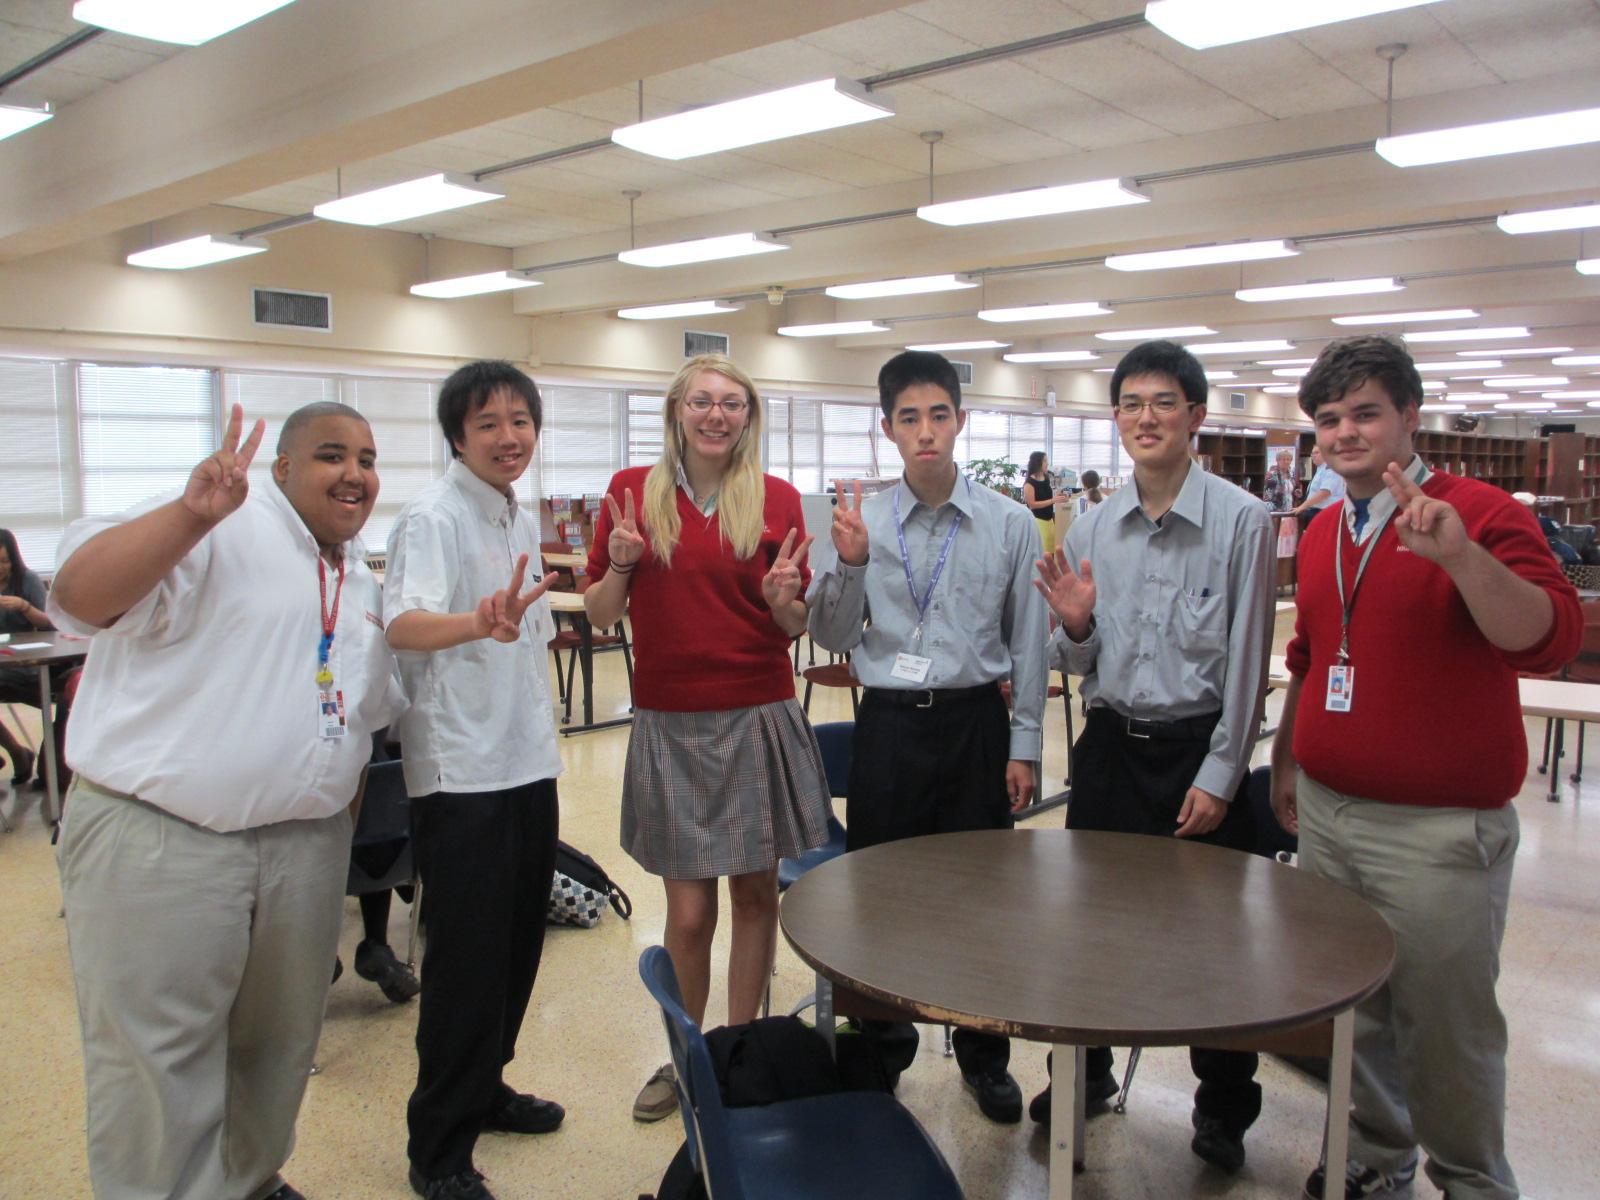 f:id:japanfoundation:20121228222422j:image:w360